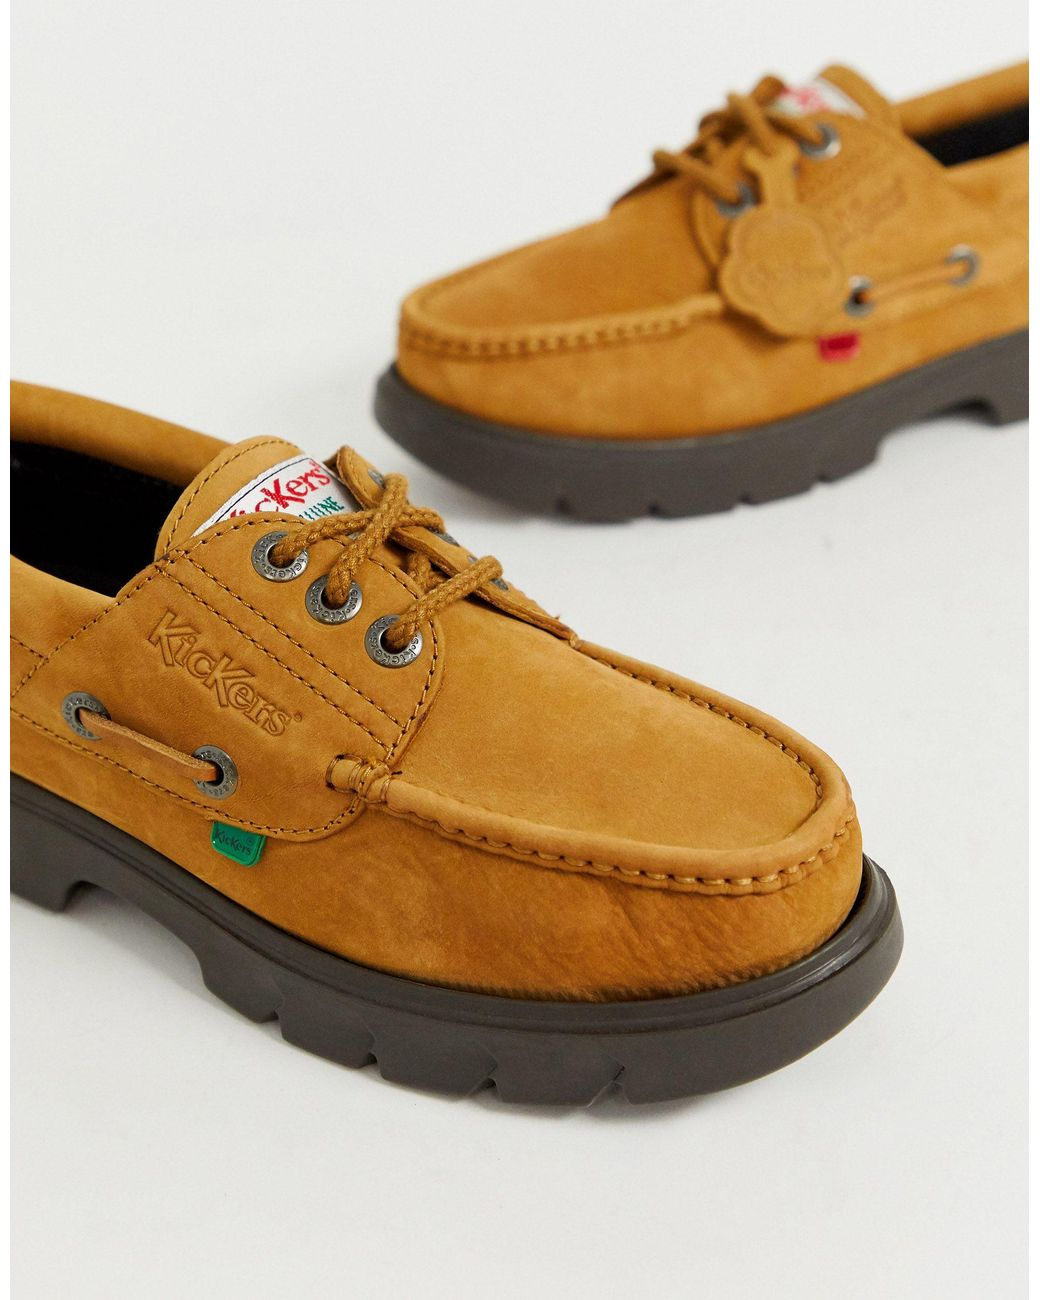 Chaussures Bateau gar/çon Kickers Lennon Boatshoe